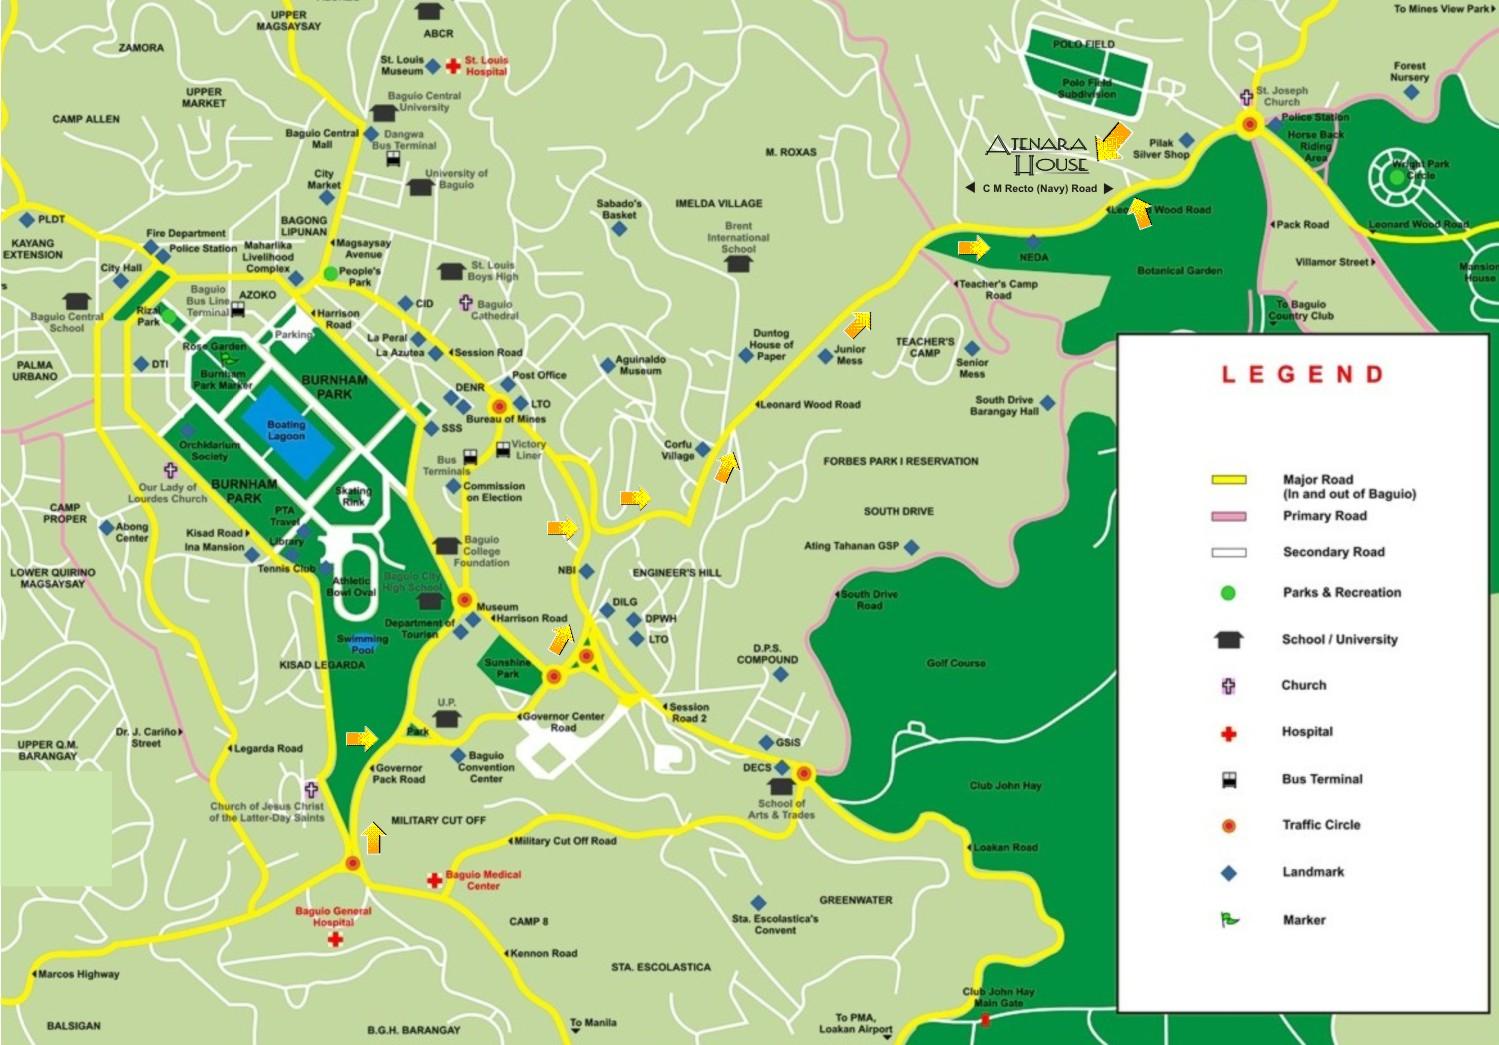 Atenara House Baguio - Baguio map